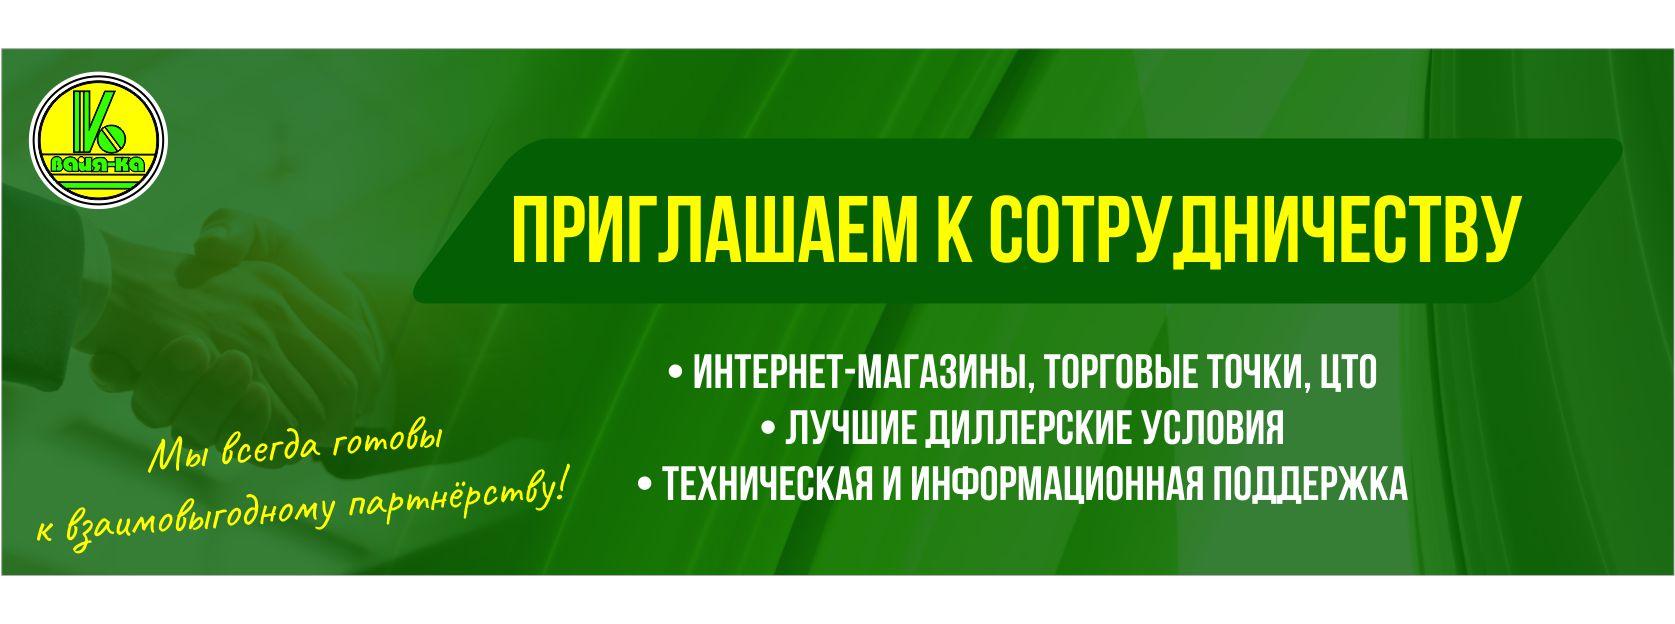 http://www.vaia.kz/blog/news/priglashenie-k-sotrudnichestvu